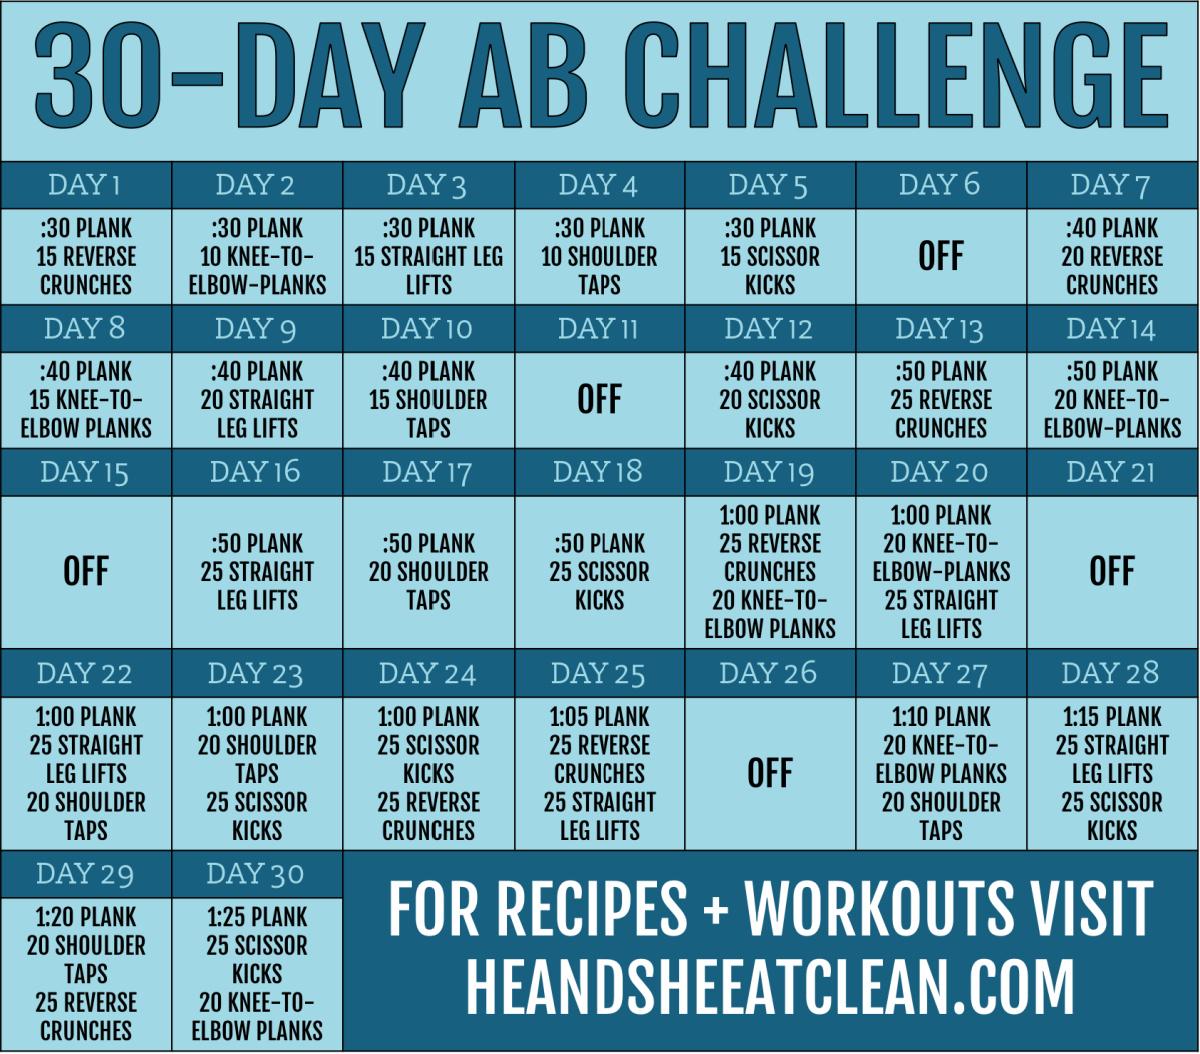 30 day ab challenge calendar